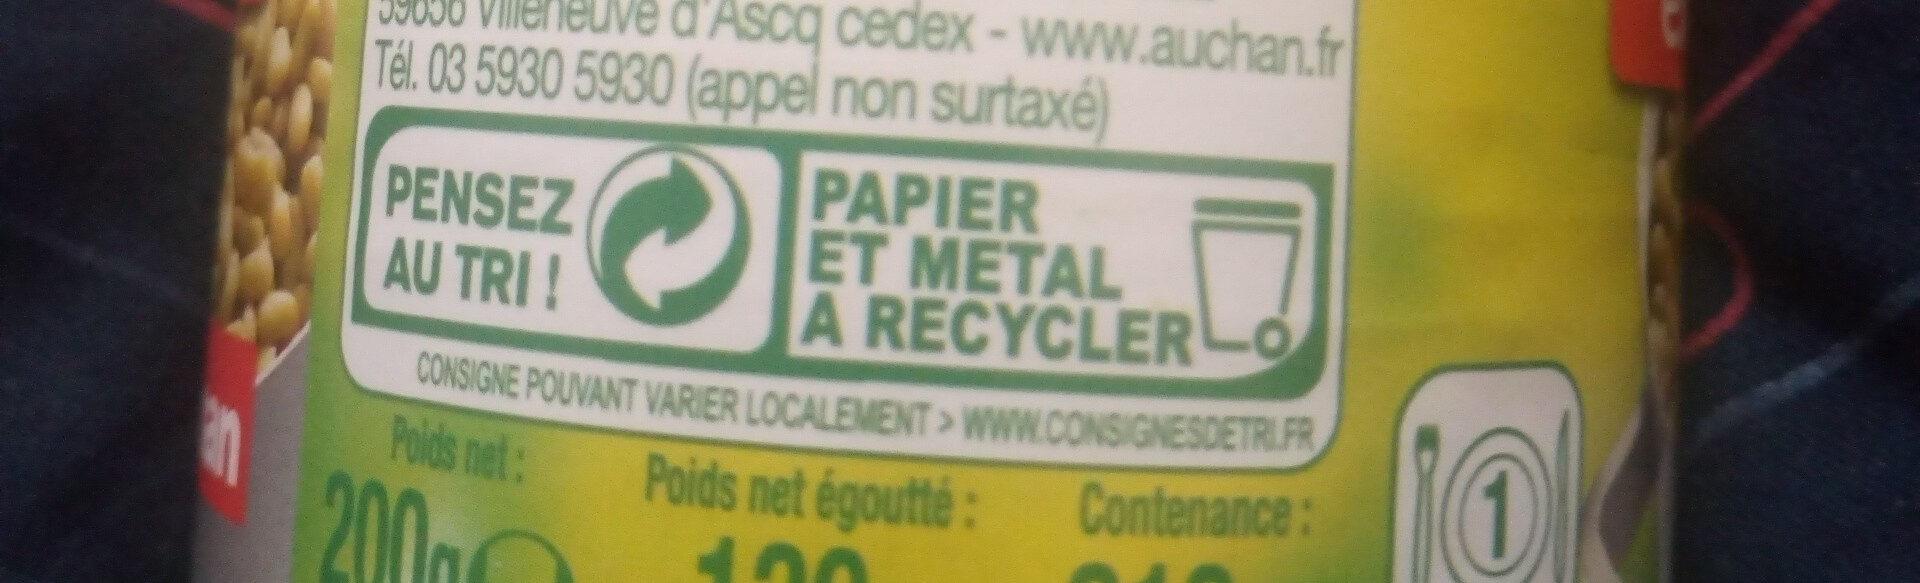 Flageolets Verts Extra Fins - Instruction de recyclage et/ou informations d'emballage - fr